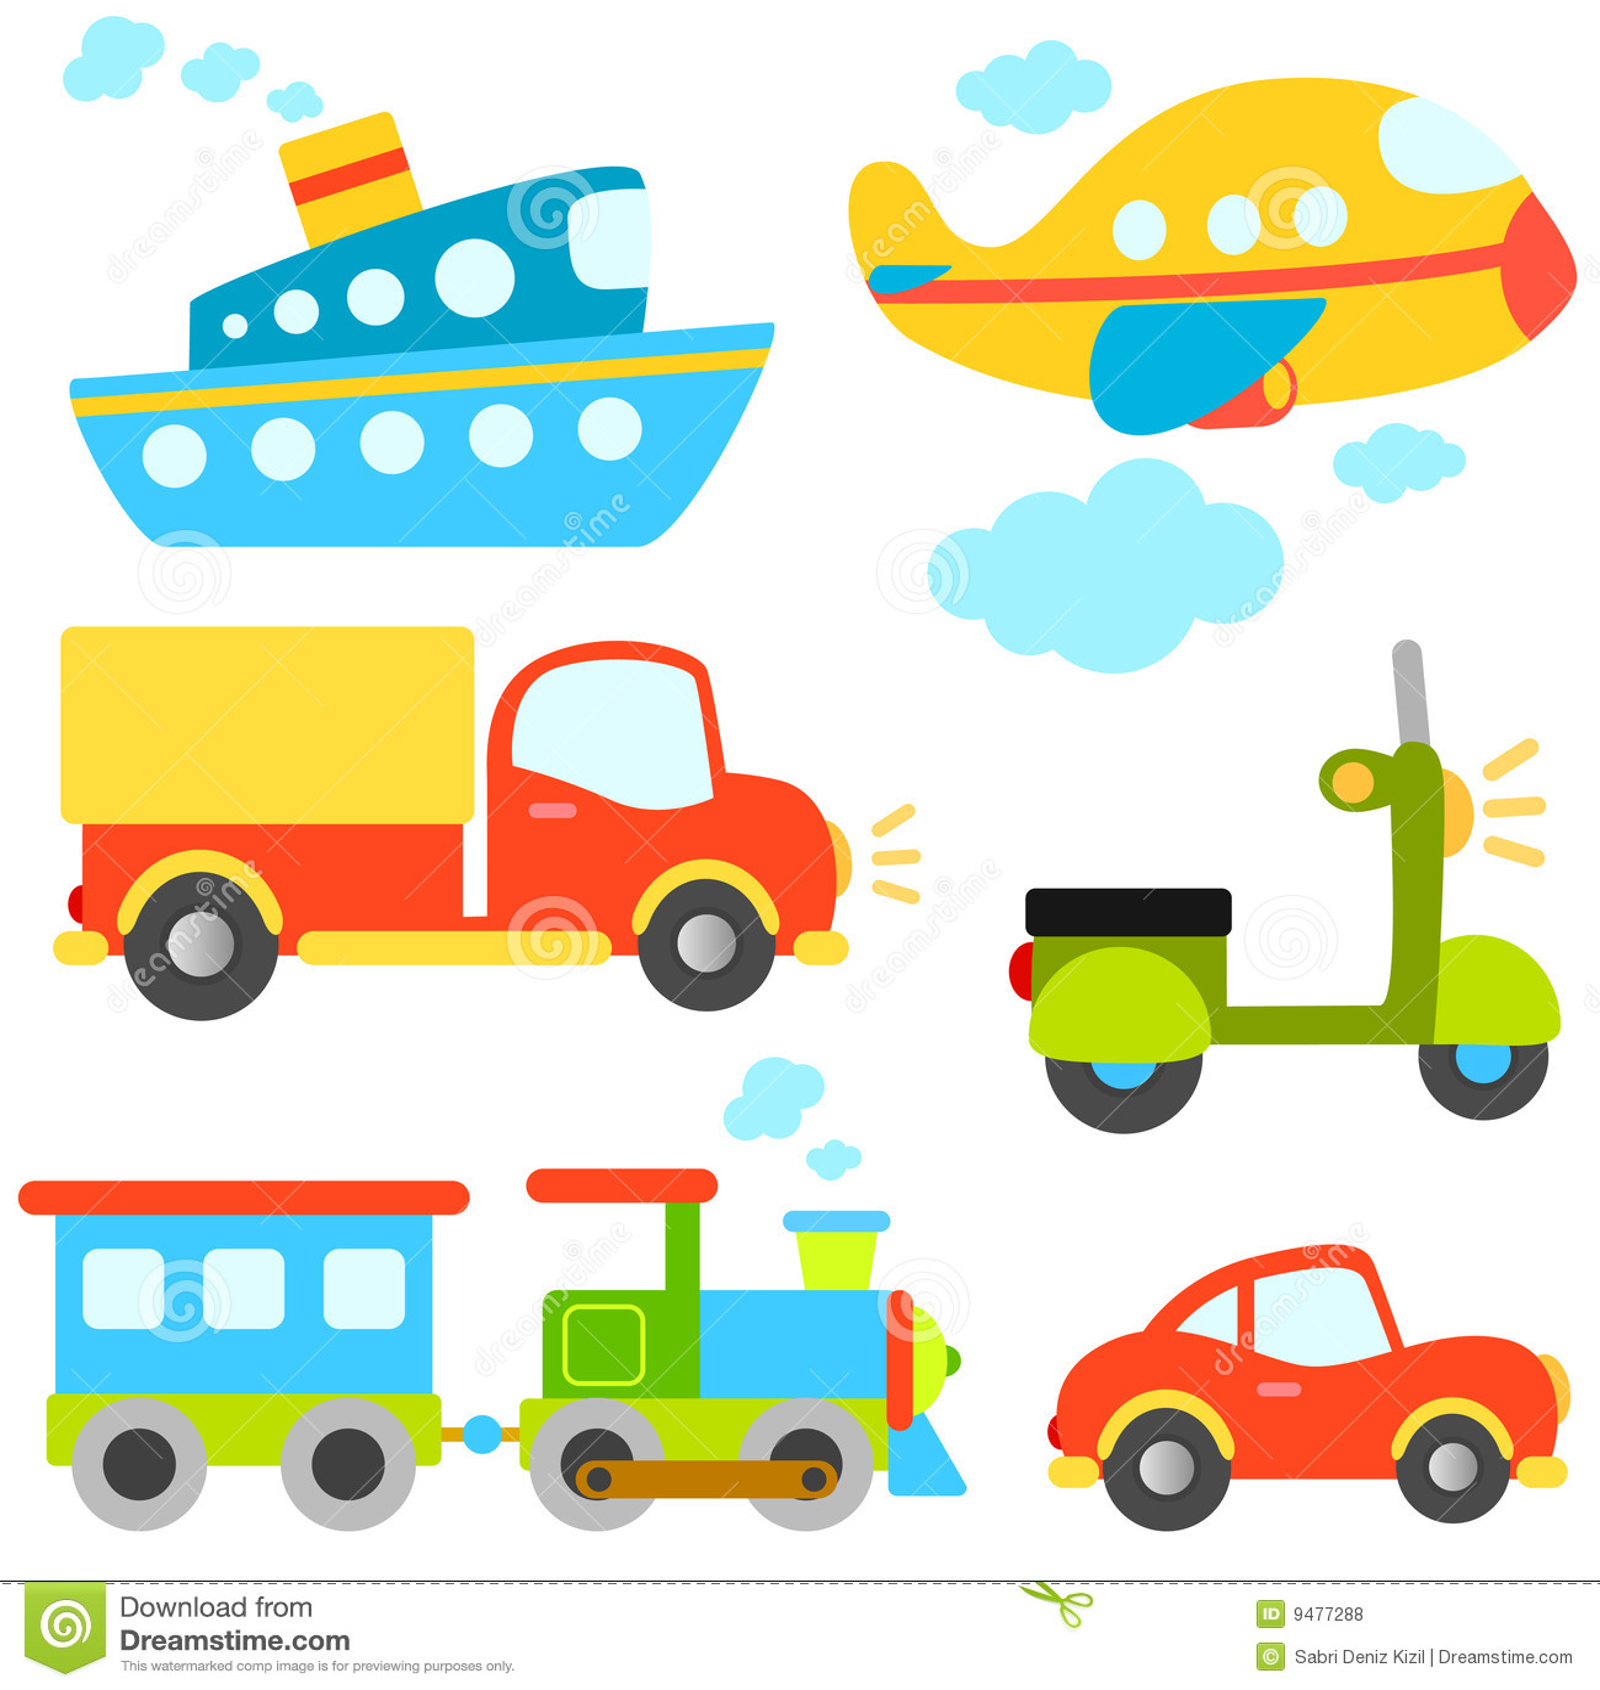 Juegos de camiones infantiles online dating 8